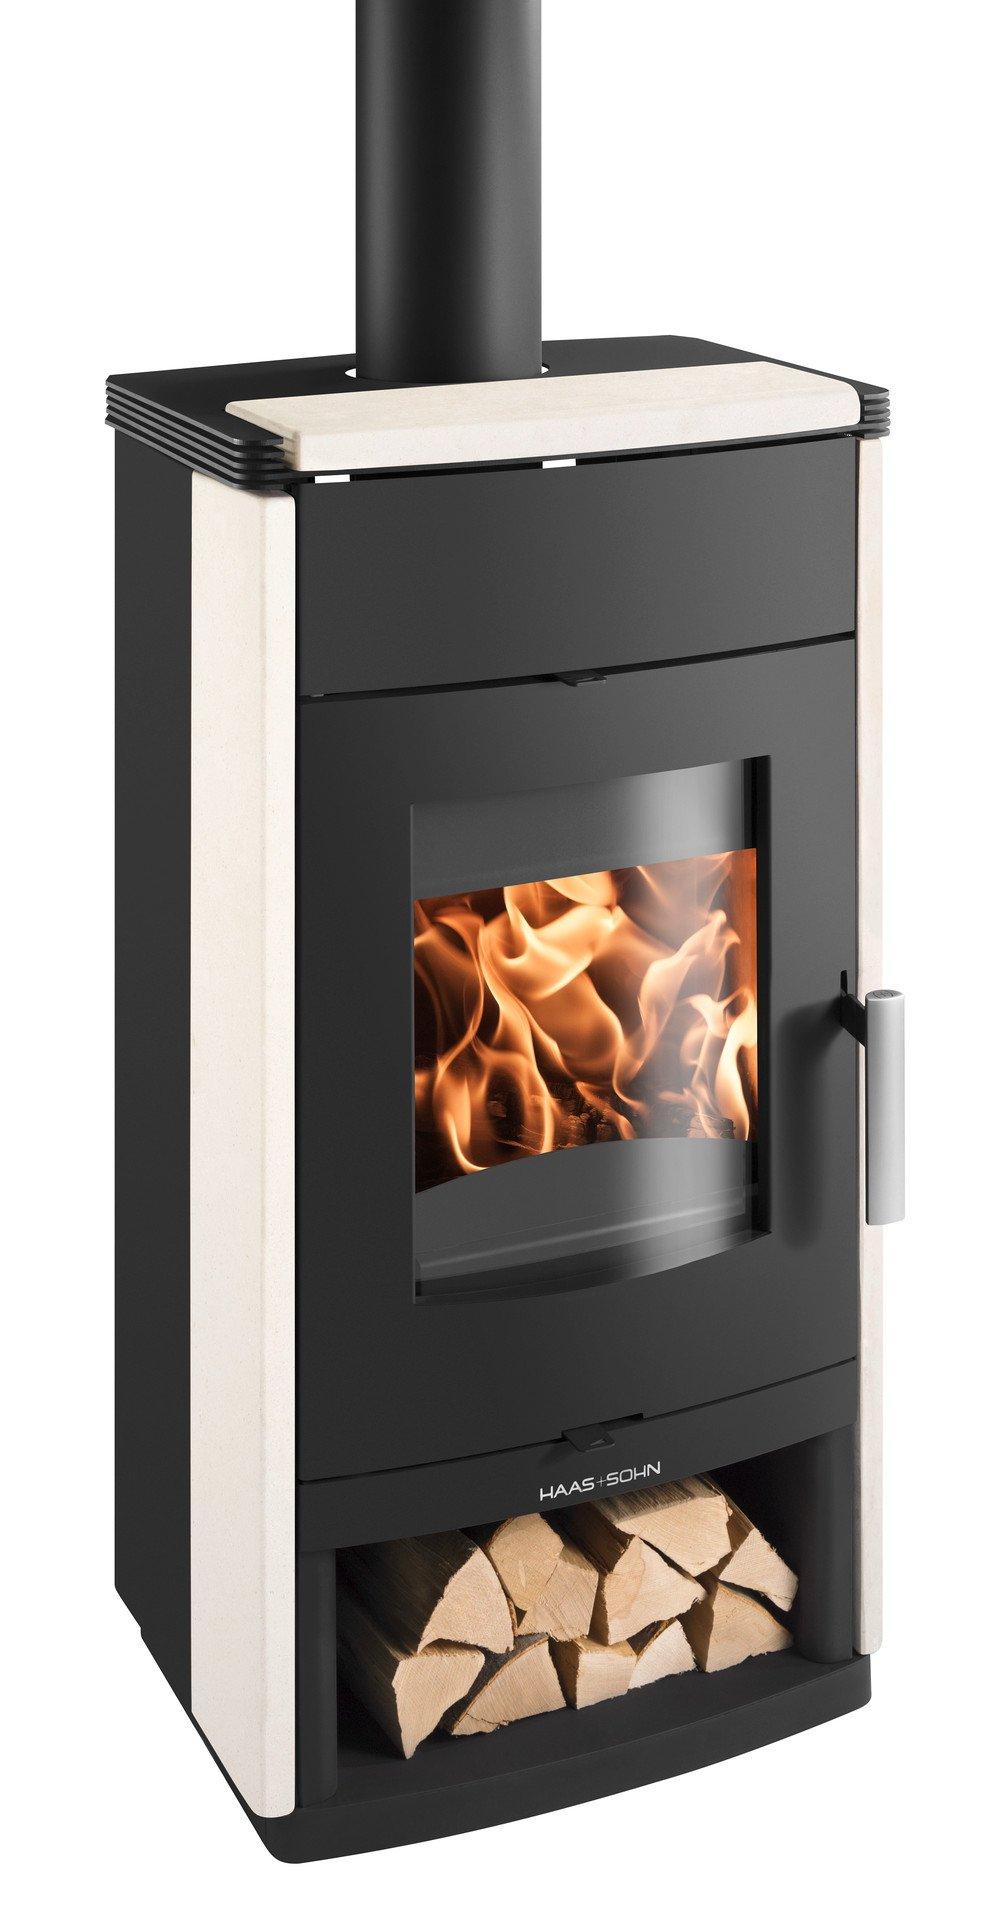 montegrotto ii wood stoves haas sohn. Black Bedroom Furniture Sets. Home Design Ideas